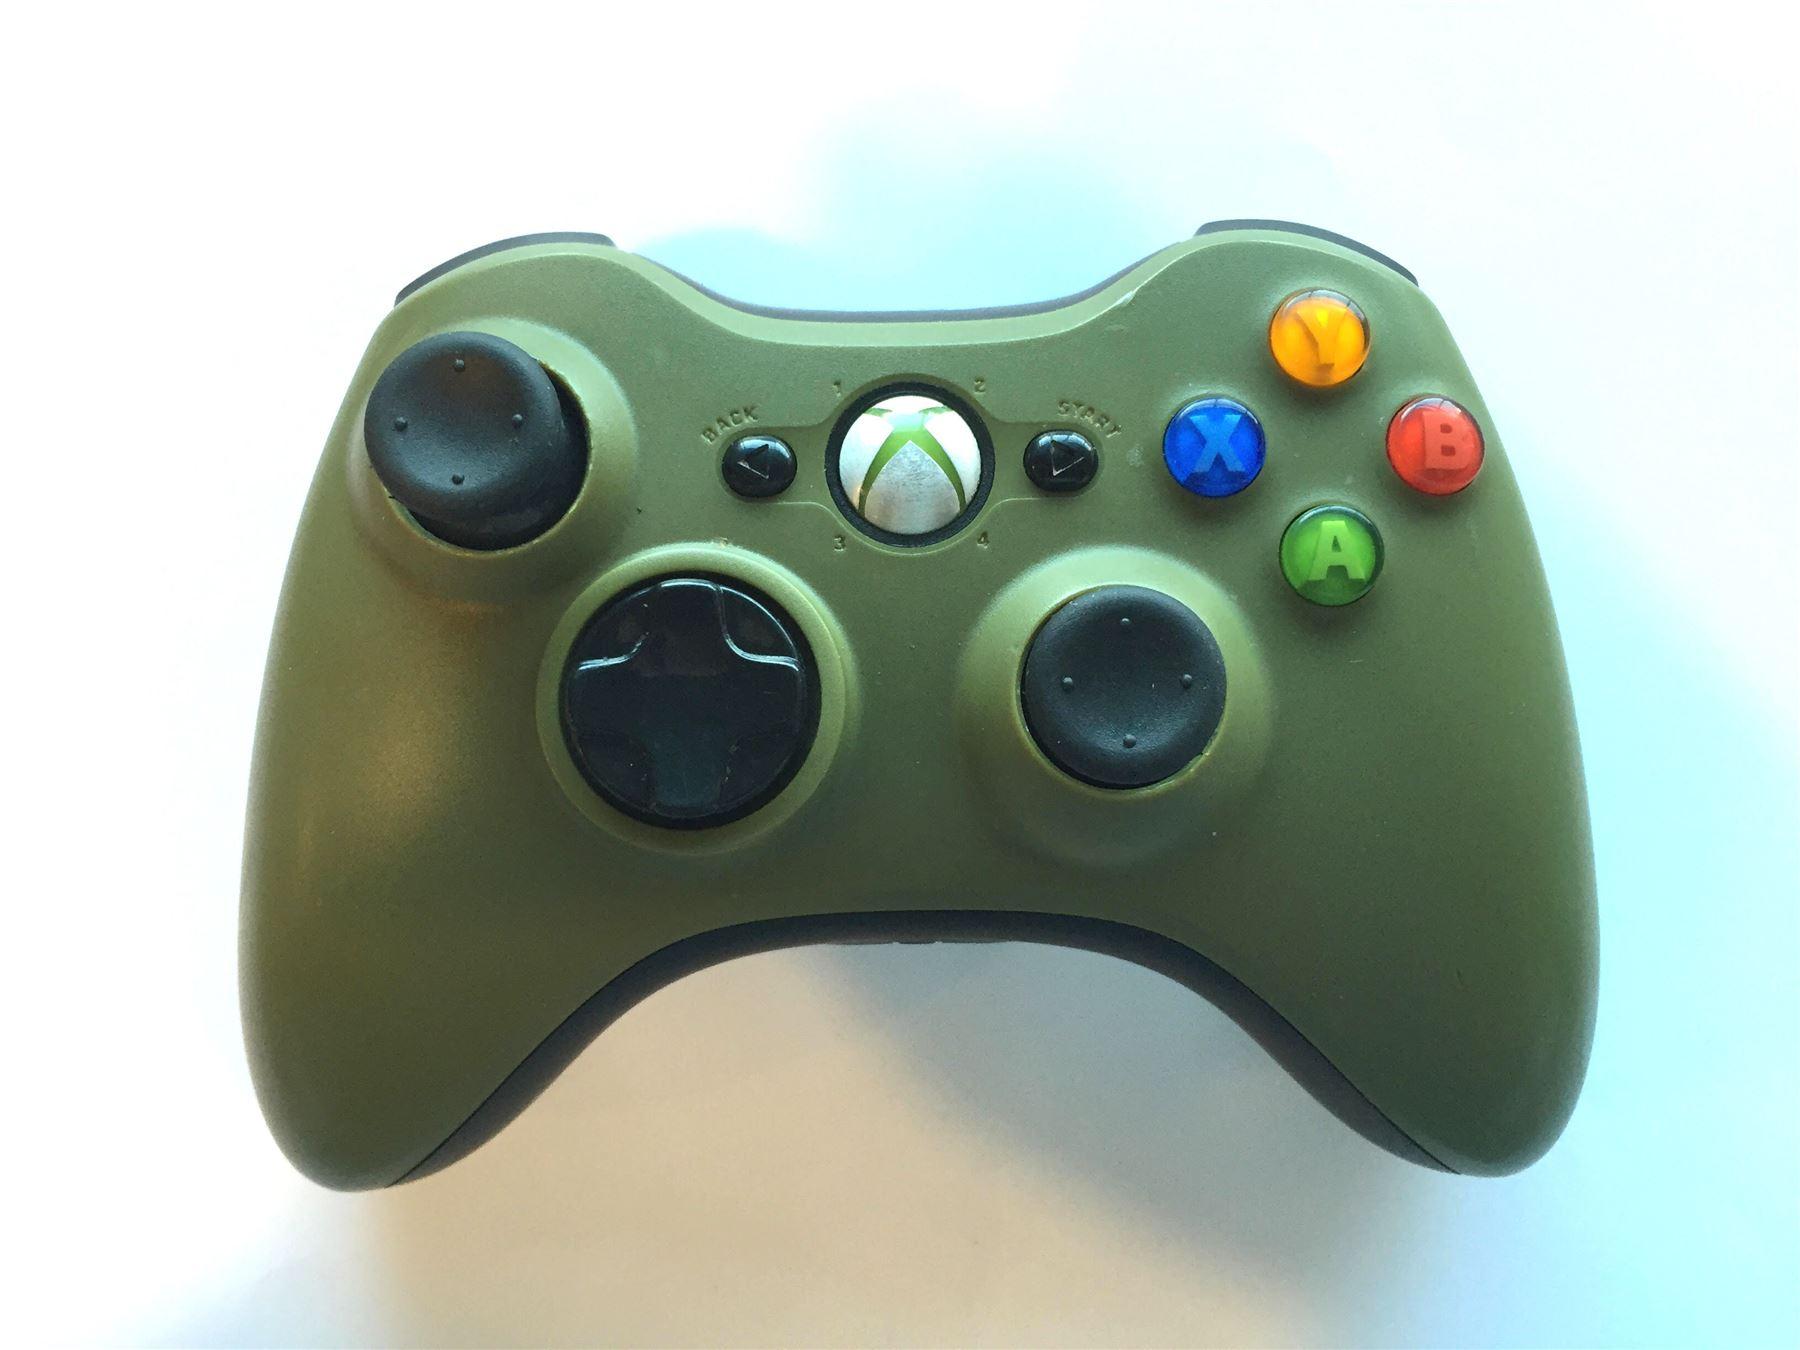 Official-Original-Genuine-Microsoft-Xbox-360-Controller-Pads-Various-Colours thumbnail 41